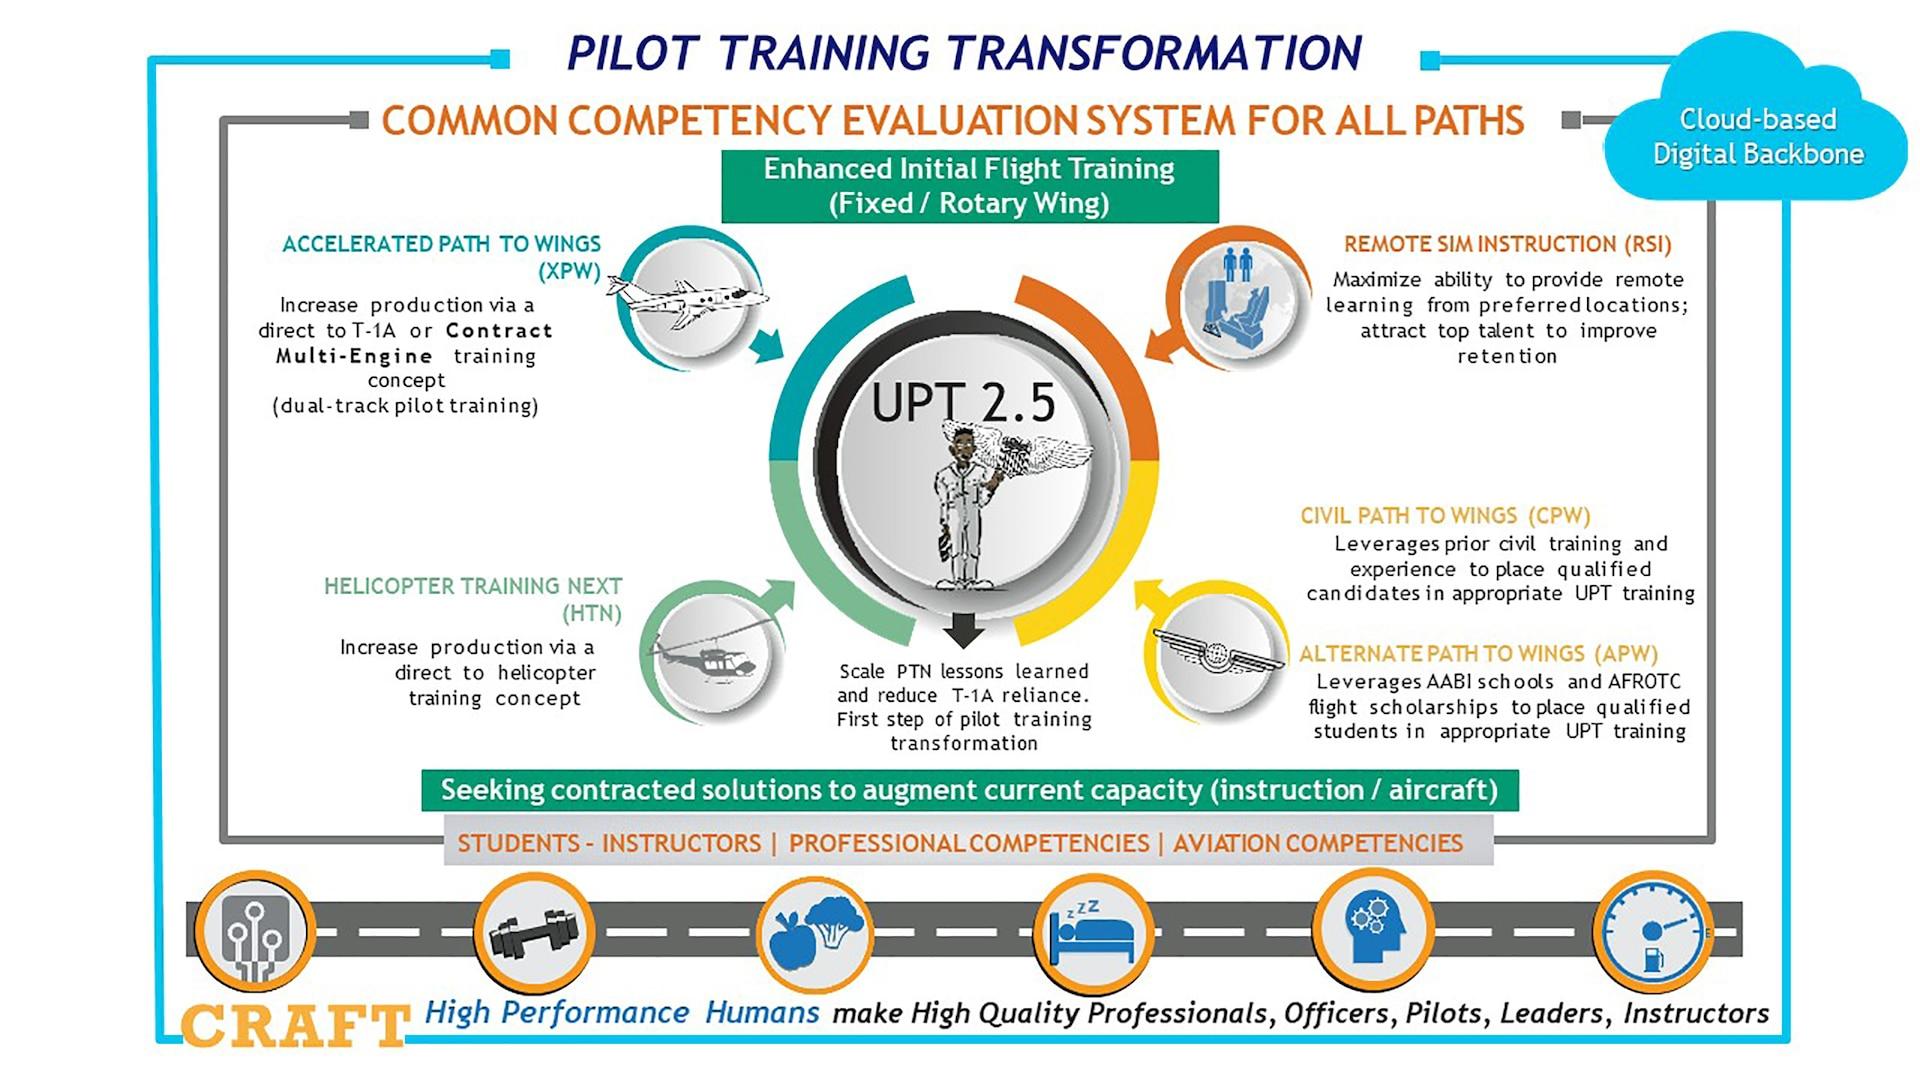 19th Air Force Pilot Training Transformation initiatives